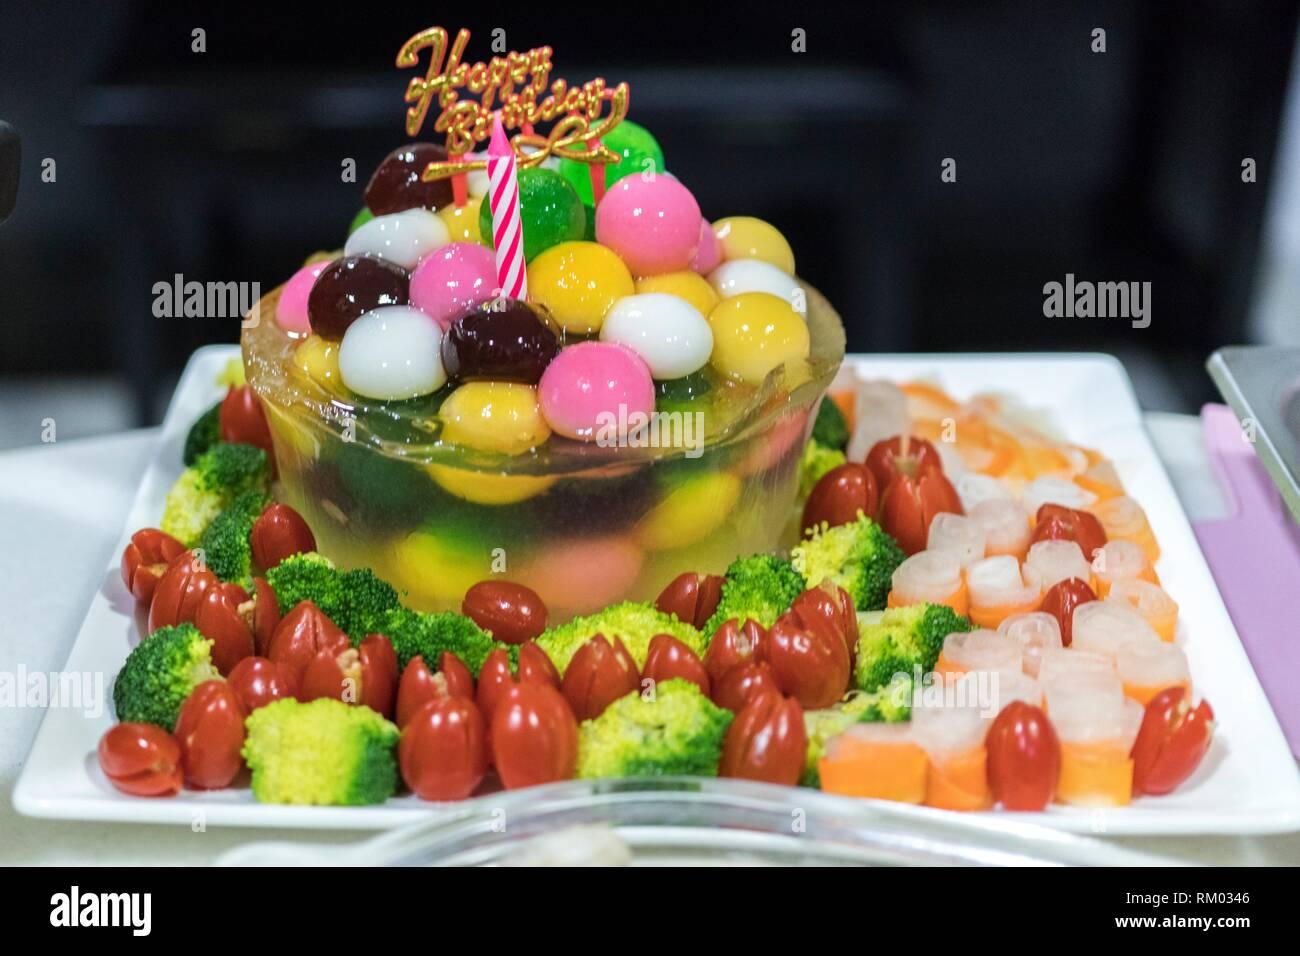 Wondrous Pudding Birthday Cake Kuching Sarawak Malaysia Stock Photo Personalised Birthday Cards Veneteletsinfo